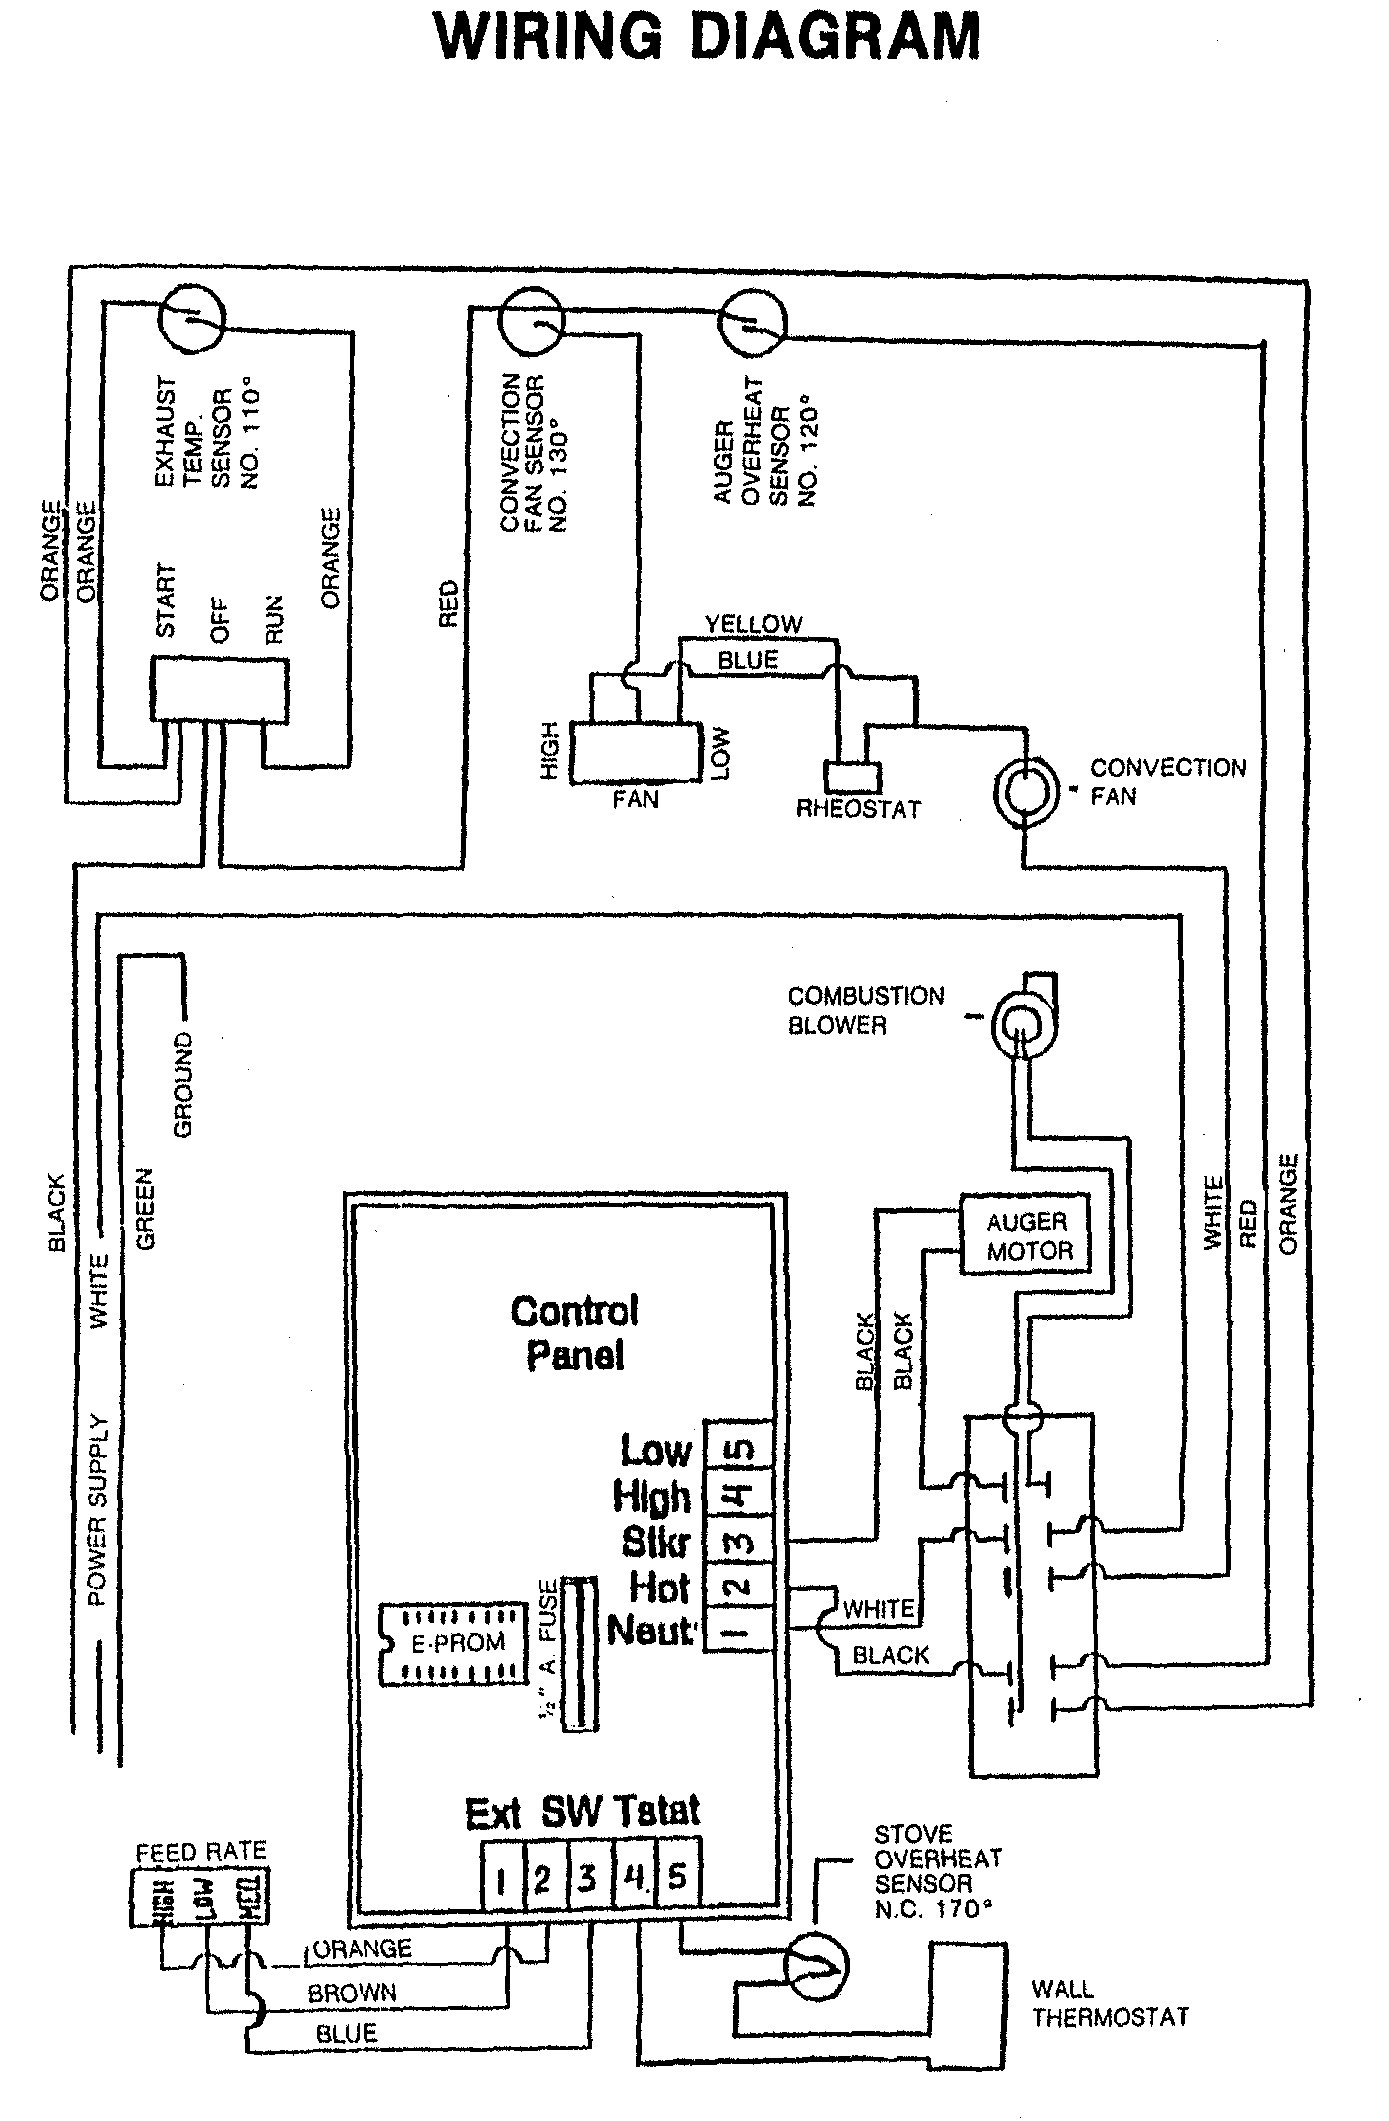 Marco Auger Motor Wiring Diagram